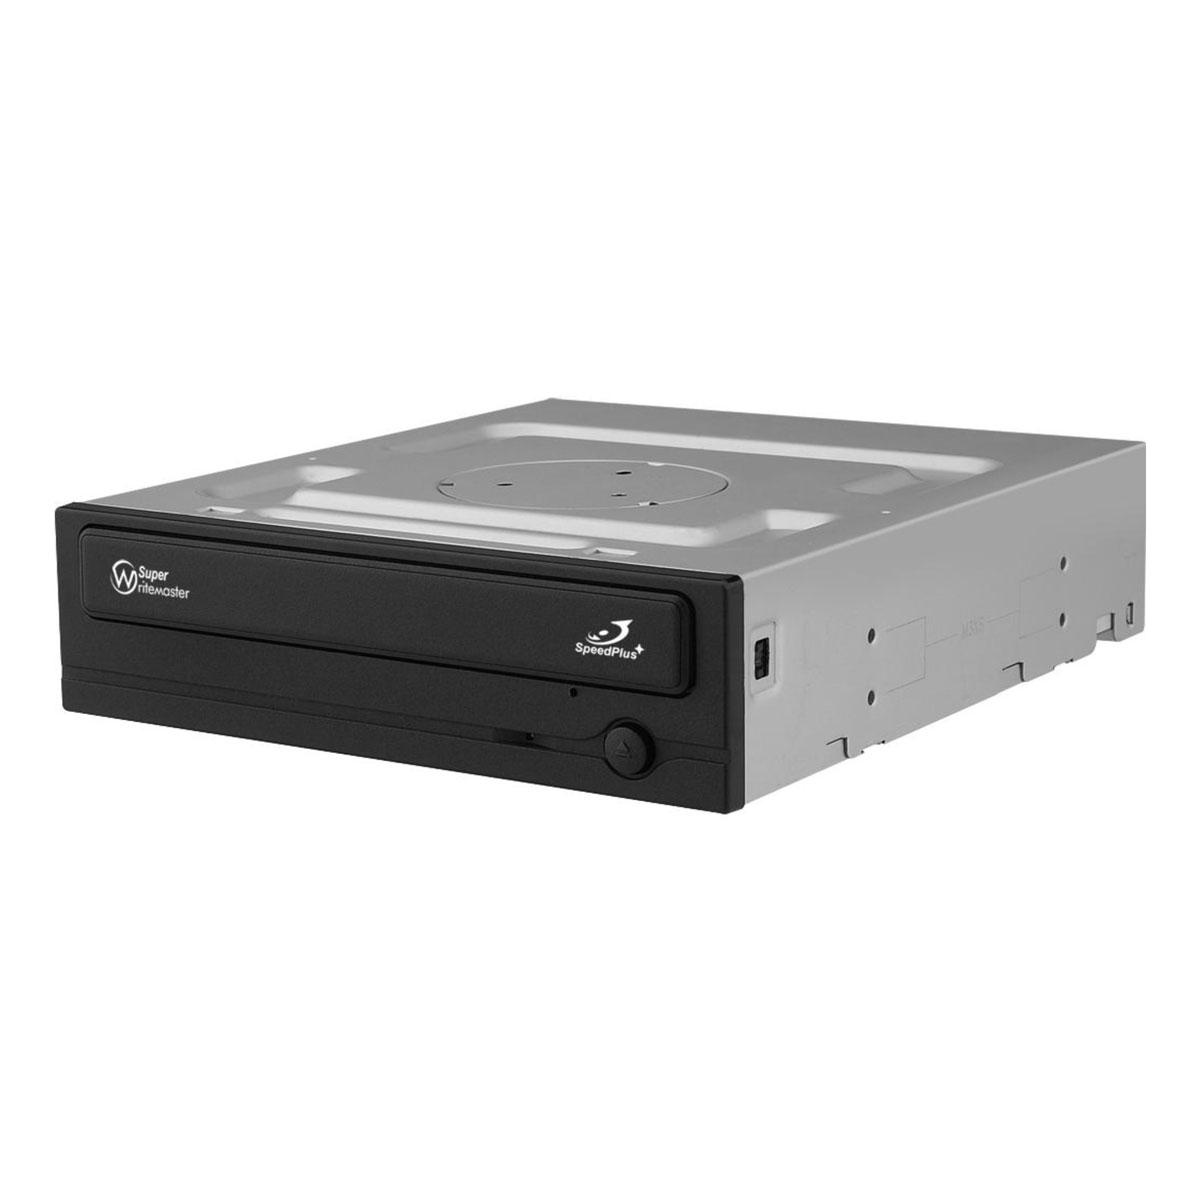 Lecteur graveur Samsung SH-224DB/BEBE DVD(+/-)RW/RAM 24/24/8/6/12x DL(+/-) 8/8x CD-R 48x SATA - Noir (bulk)